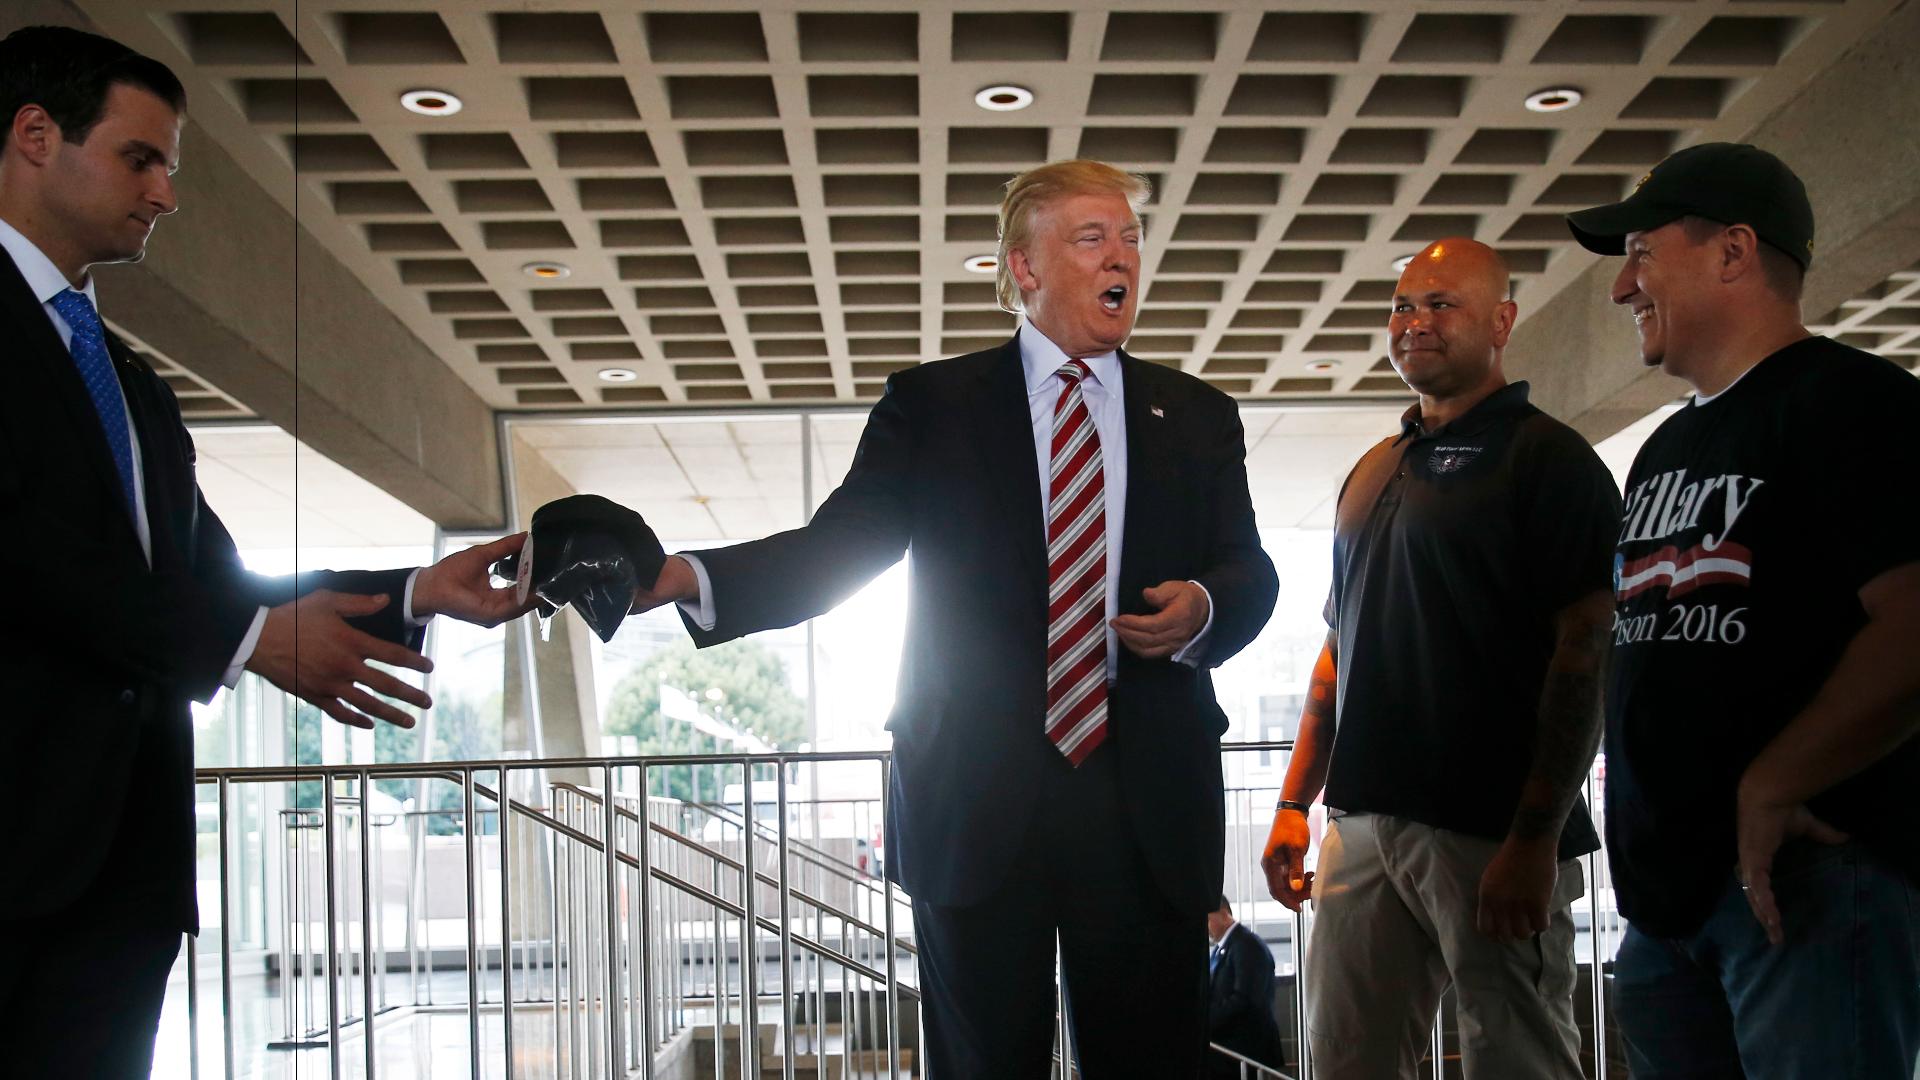 Trump shakes up campaign, demotes top adviser